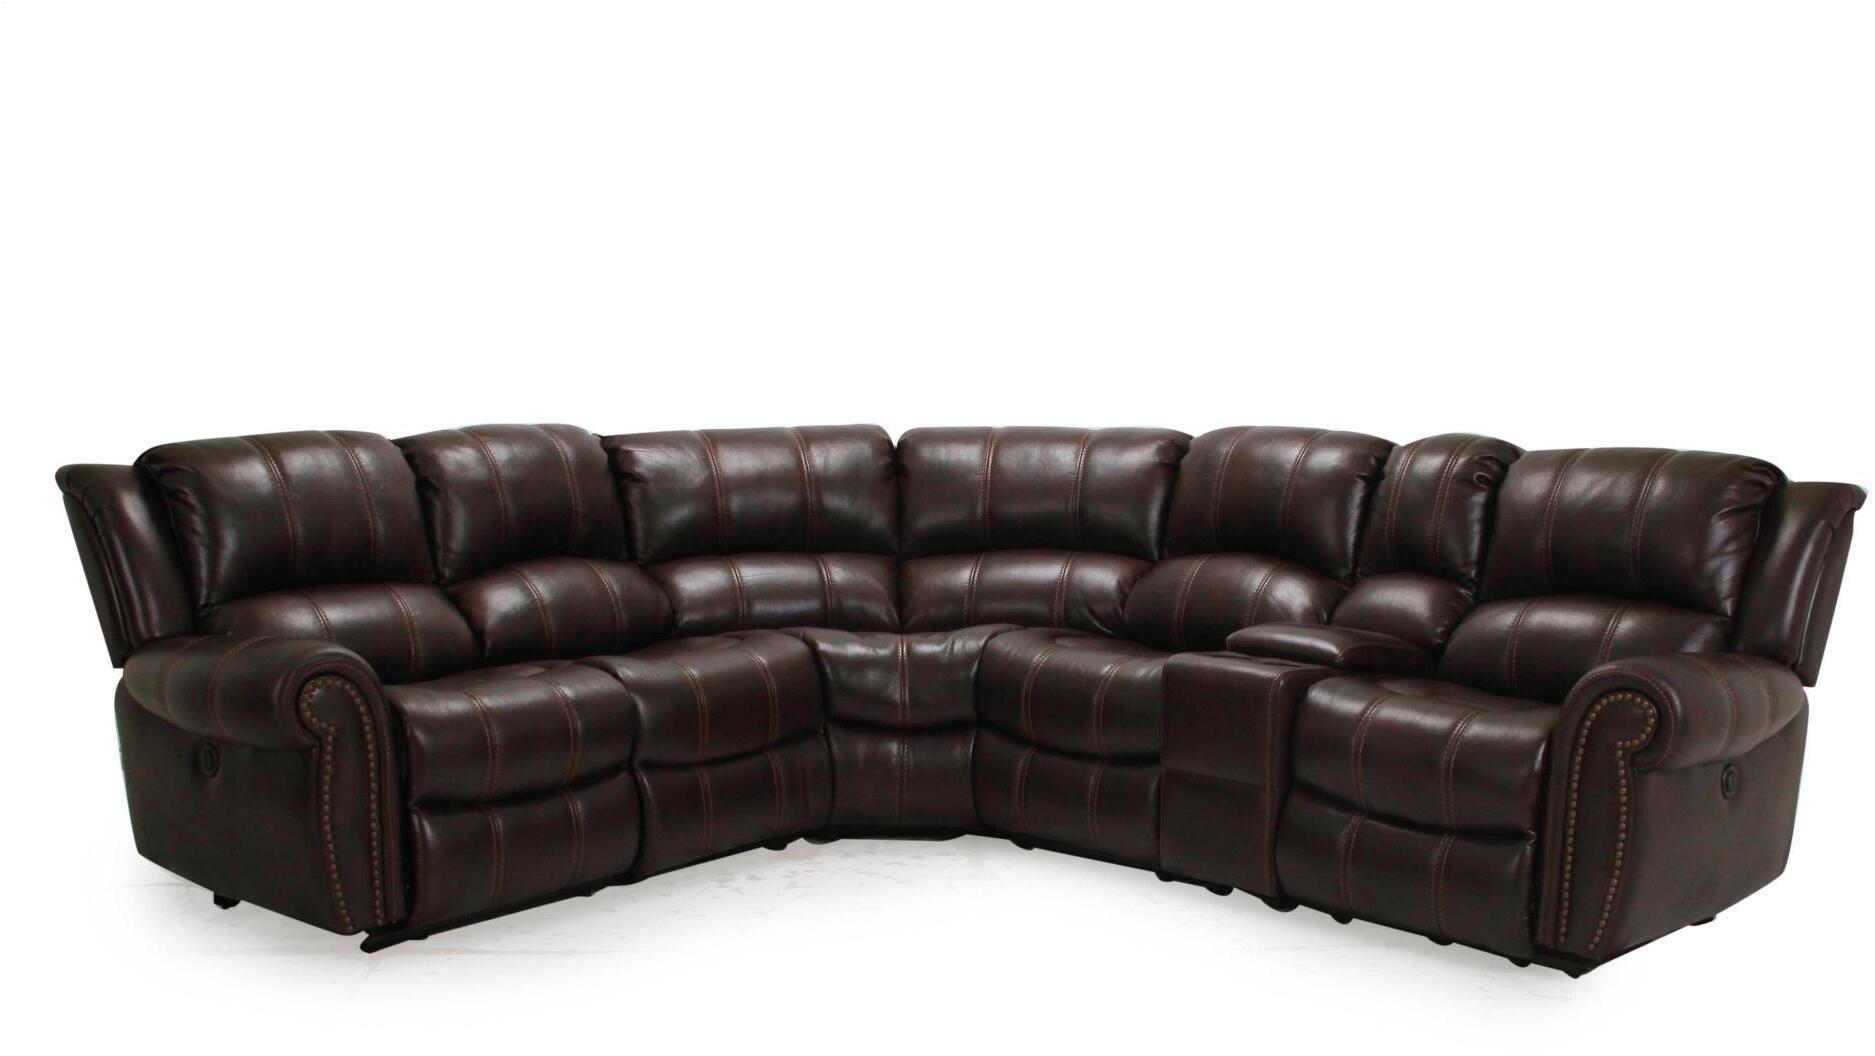 Myco furniture gretna 1